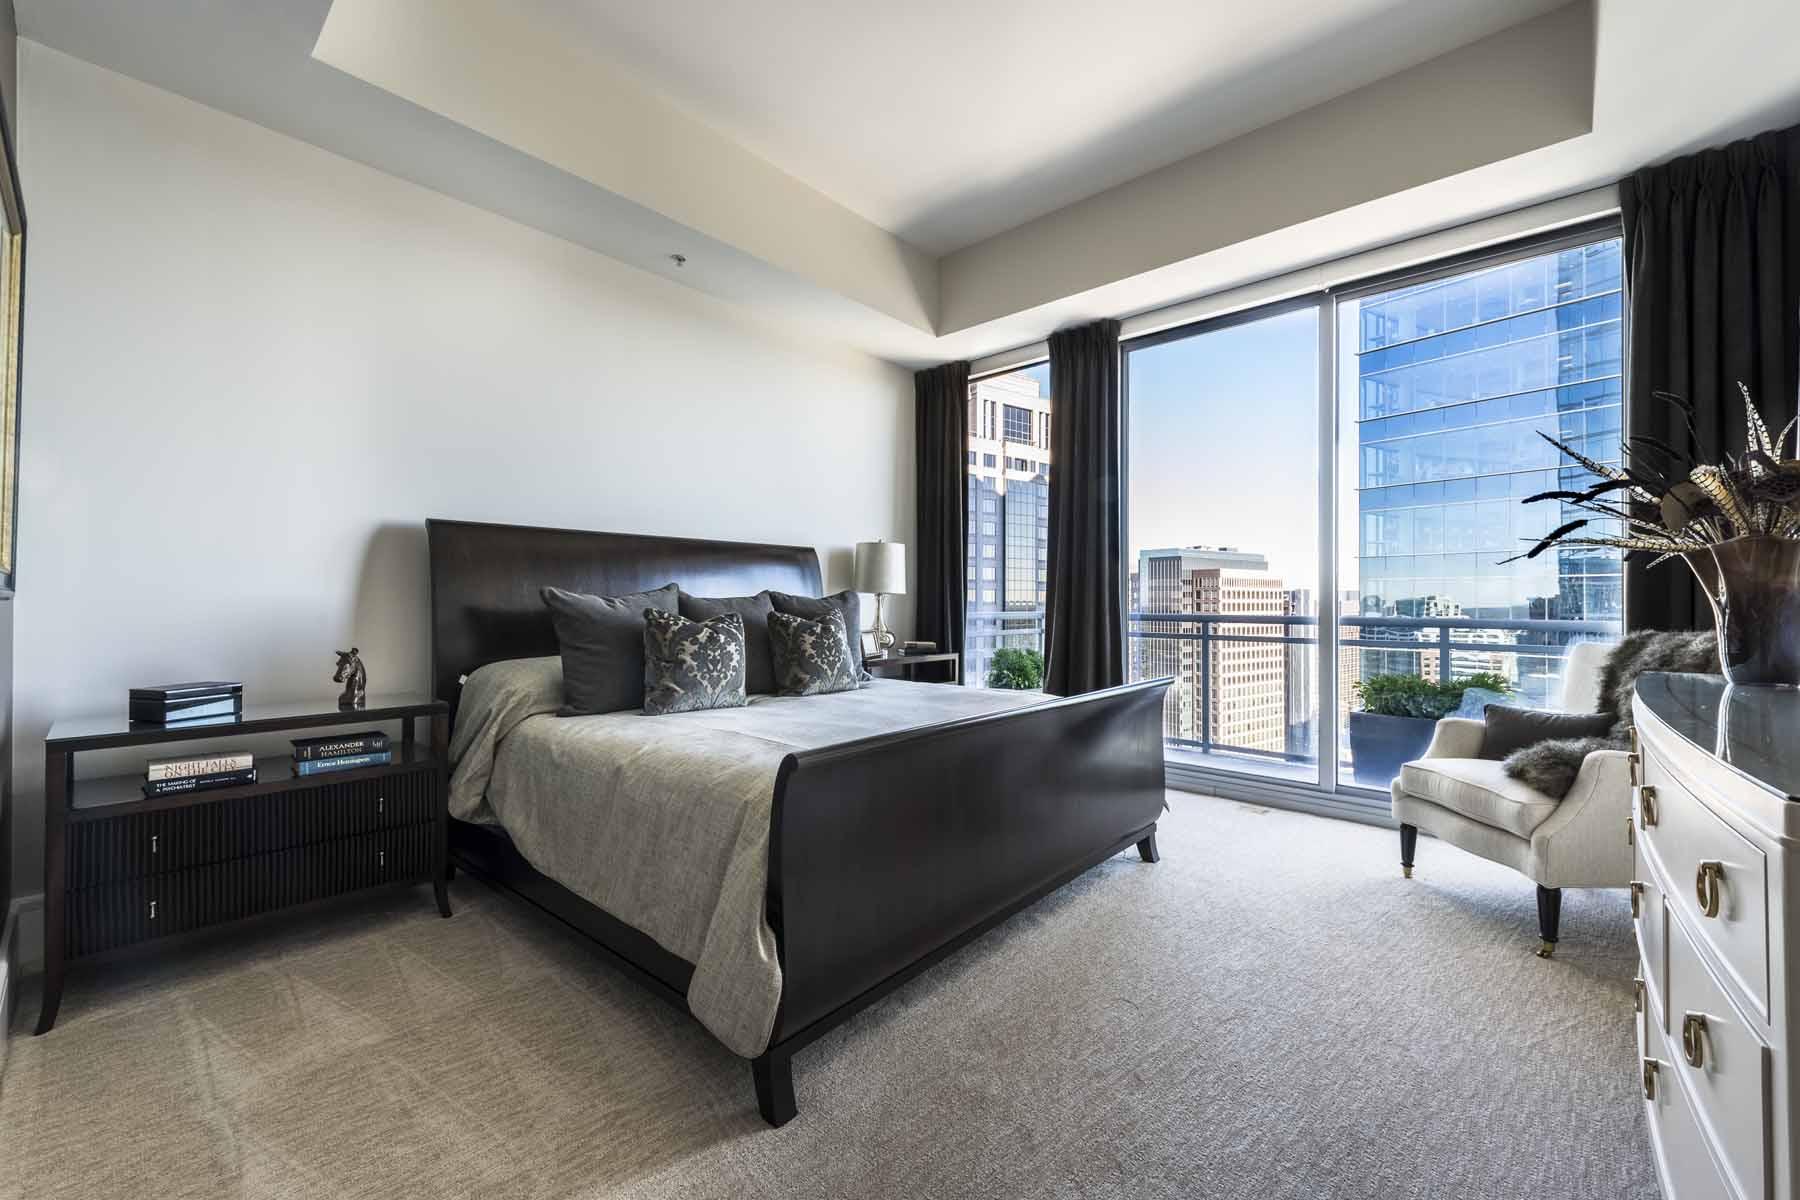 Condominium for Sale at One Bedroom Condo in Hip Intown Atlanta Location 1065 Peachtree Street NE Unit 3201 Atlanta, Georgia, 30309 United States